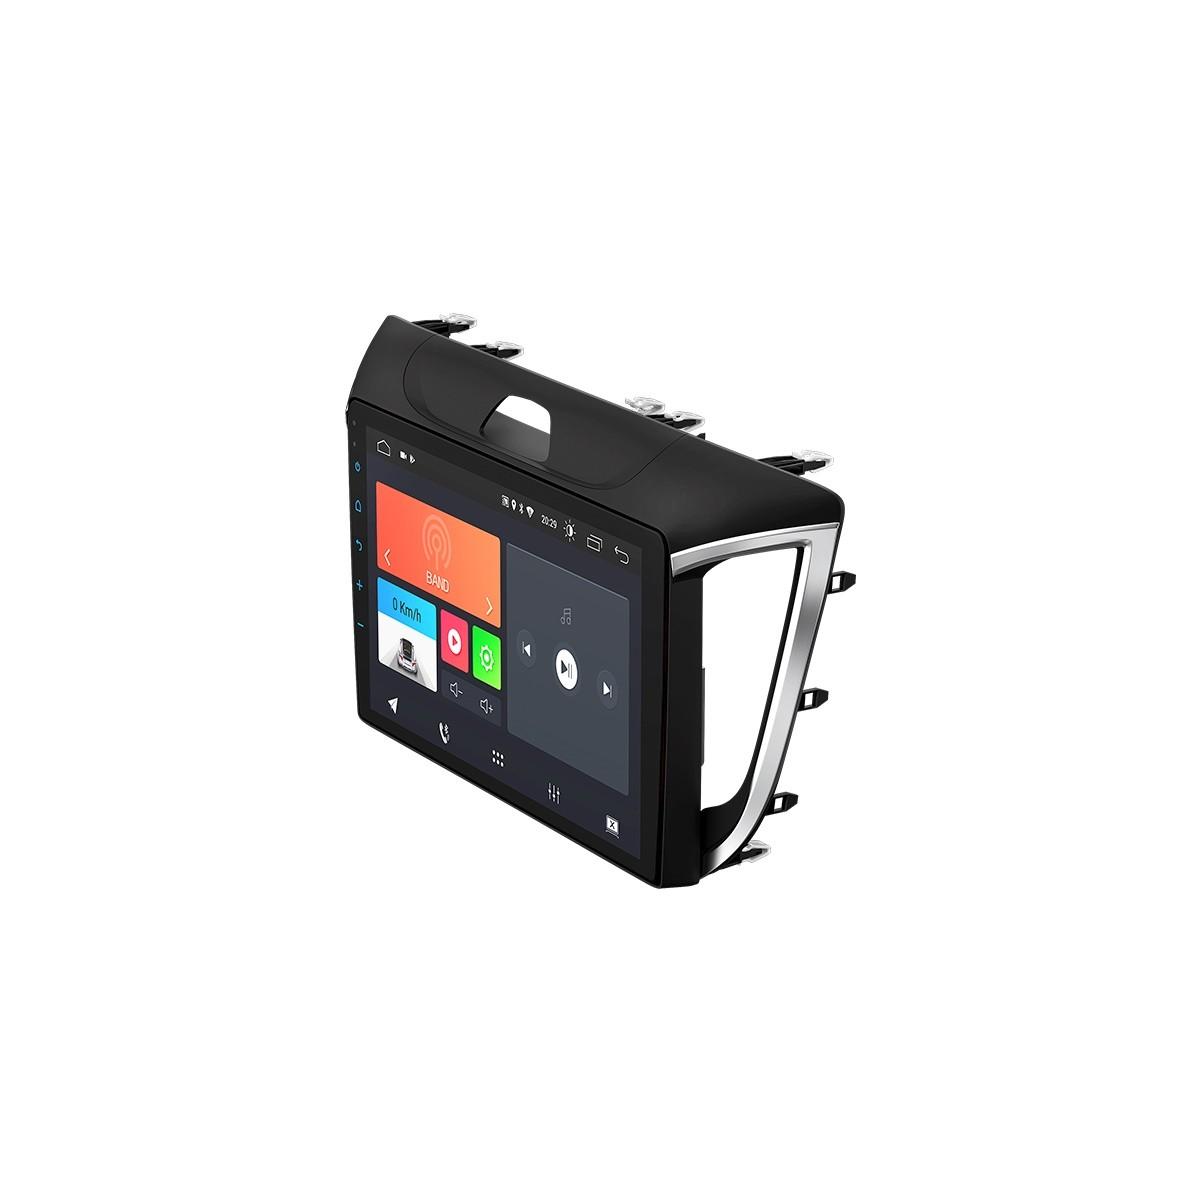 "Multimídia Android Faaftech 10,1"" FT-MM-AND10.1 HY2 USB Bluetooth Espelhamento Google Play Android 10 para Creta"